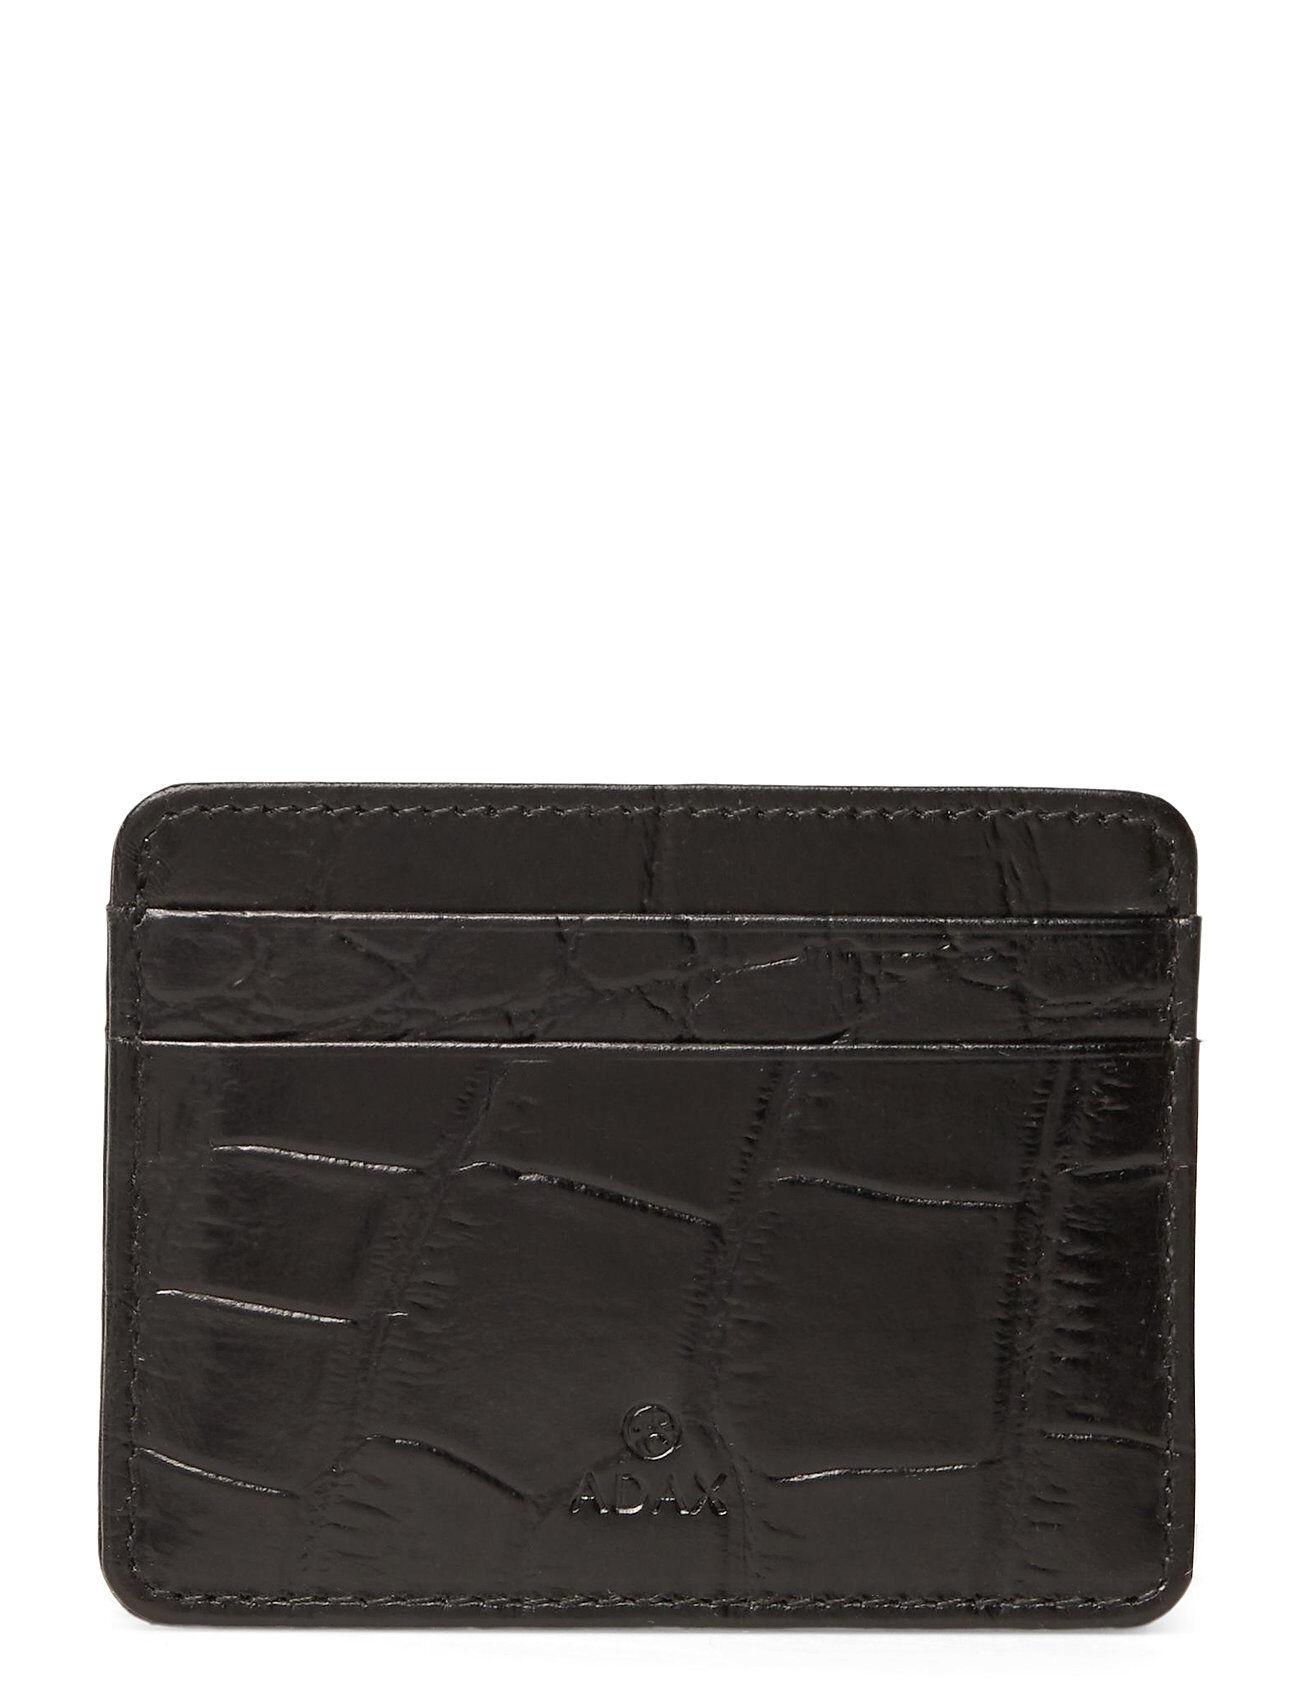 Adax Teramo Card Holder Noel Bags Card Holders & Wallets Card Holder Musta Adax